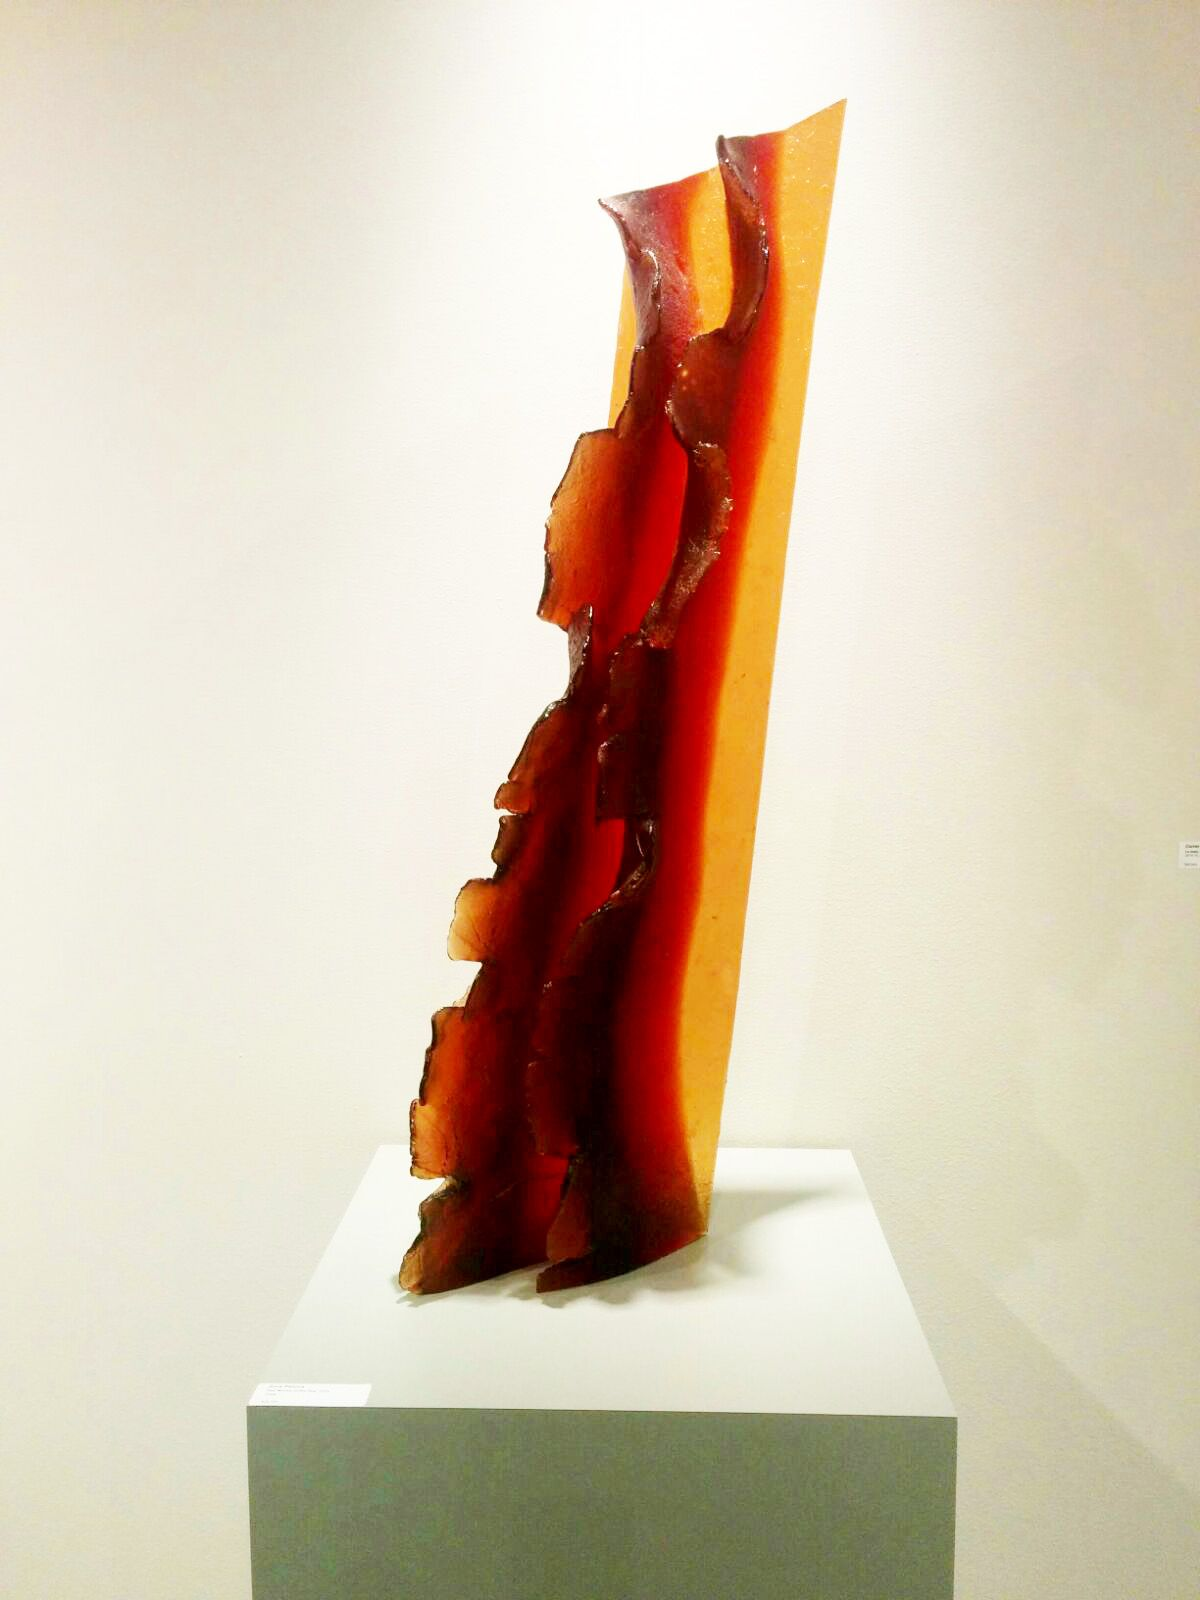 The Best of Glass Art Zora Palova glass sculpture The Best of Glass Sculpture Art: Zora Palova The Best of Glass Art Zora Palova 1 2